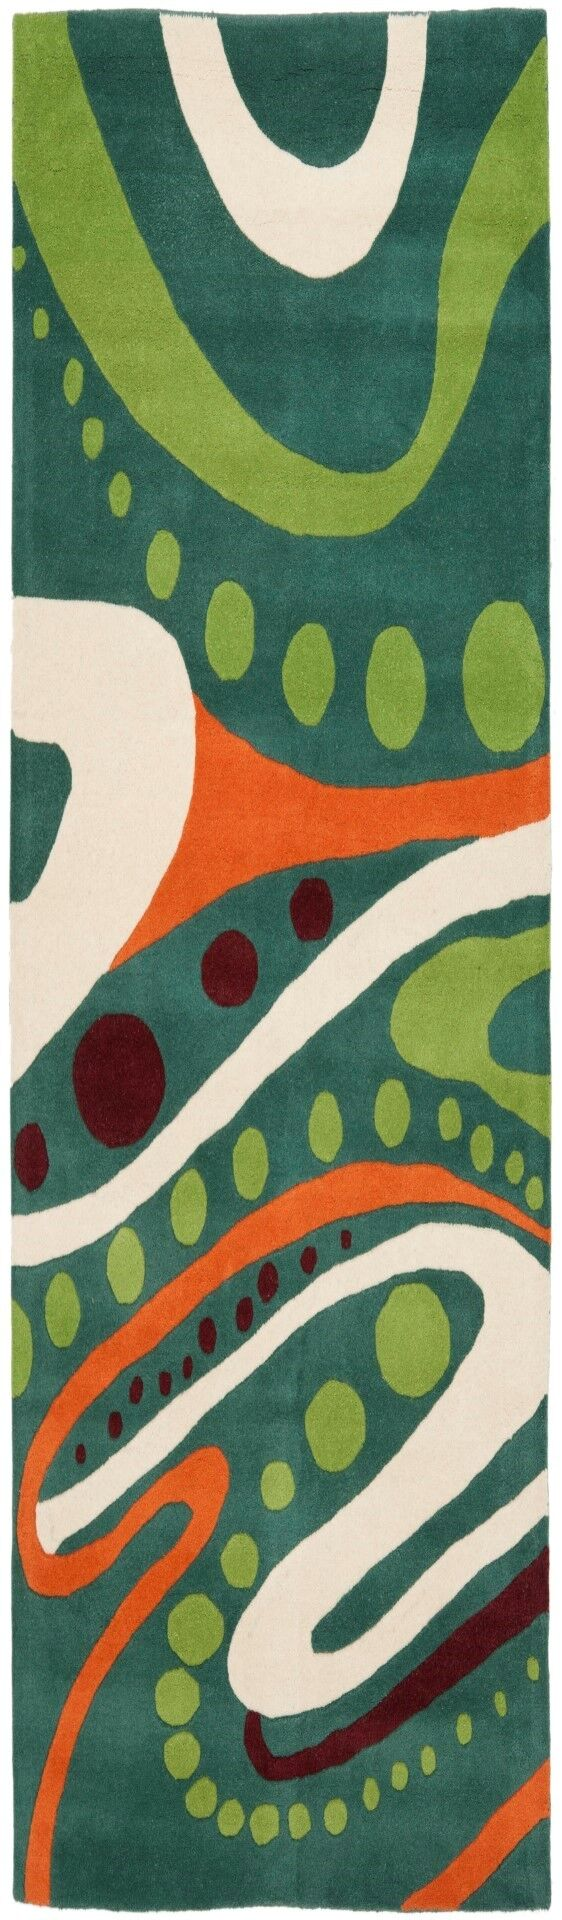 Woodburn Hand-Tufted Teal Area Rug Rug Size: Rectangle 9' x 12'